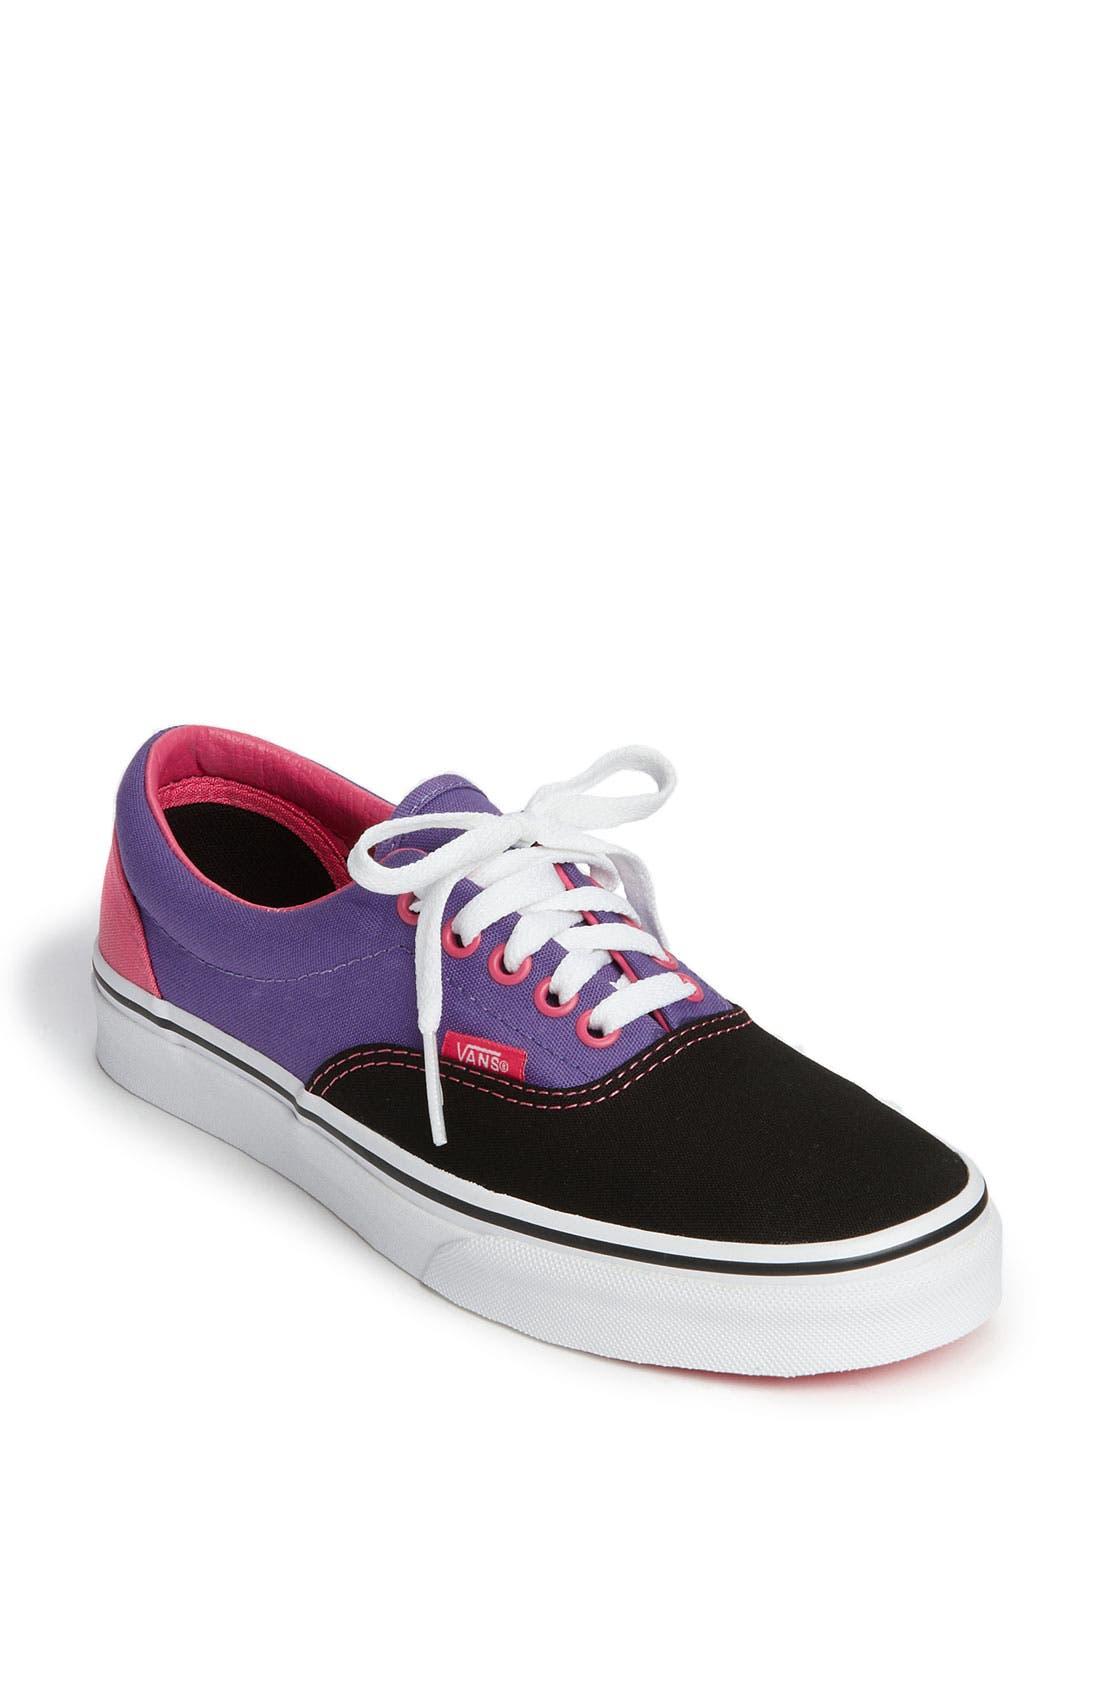 Main Image - Vans 'Era Tri Tone' Sneaker (Women)